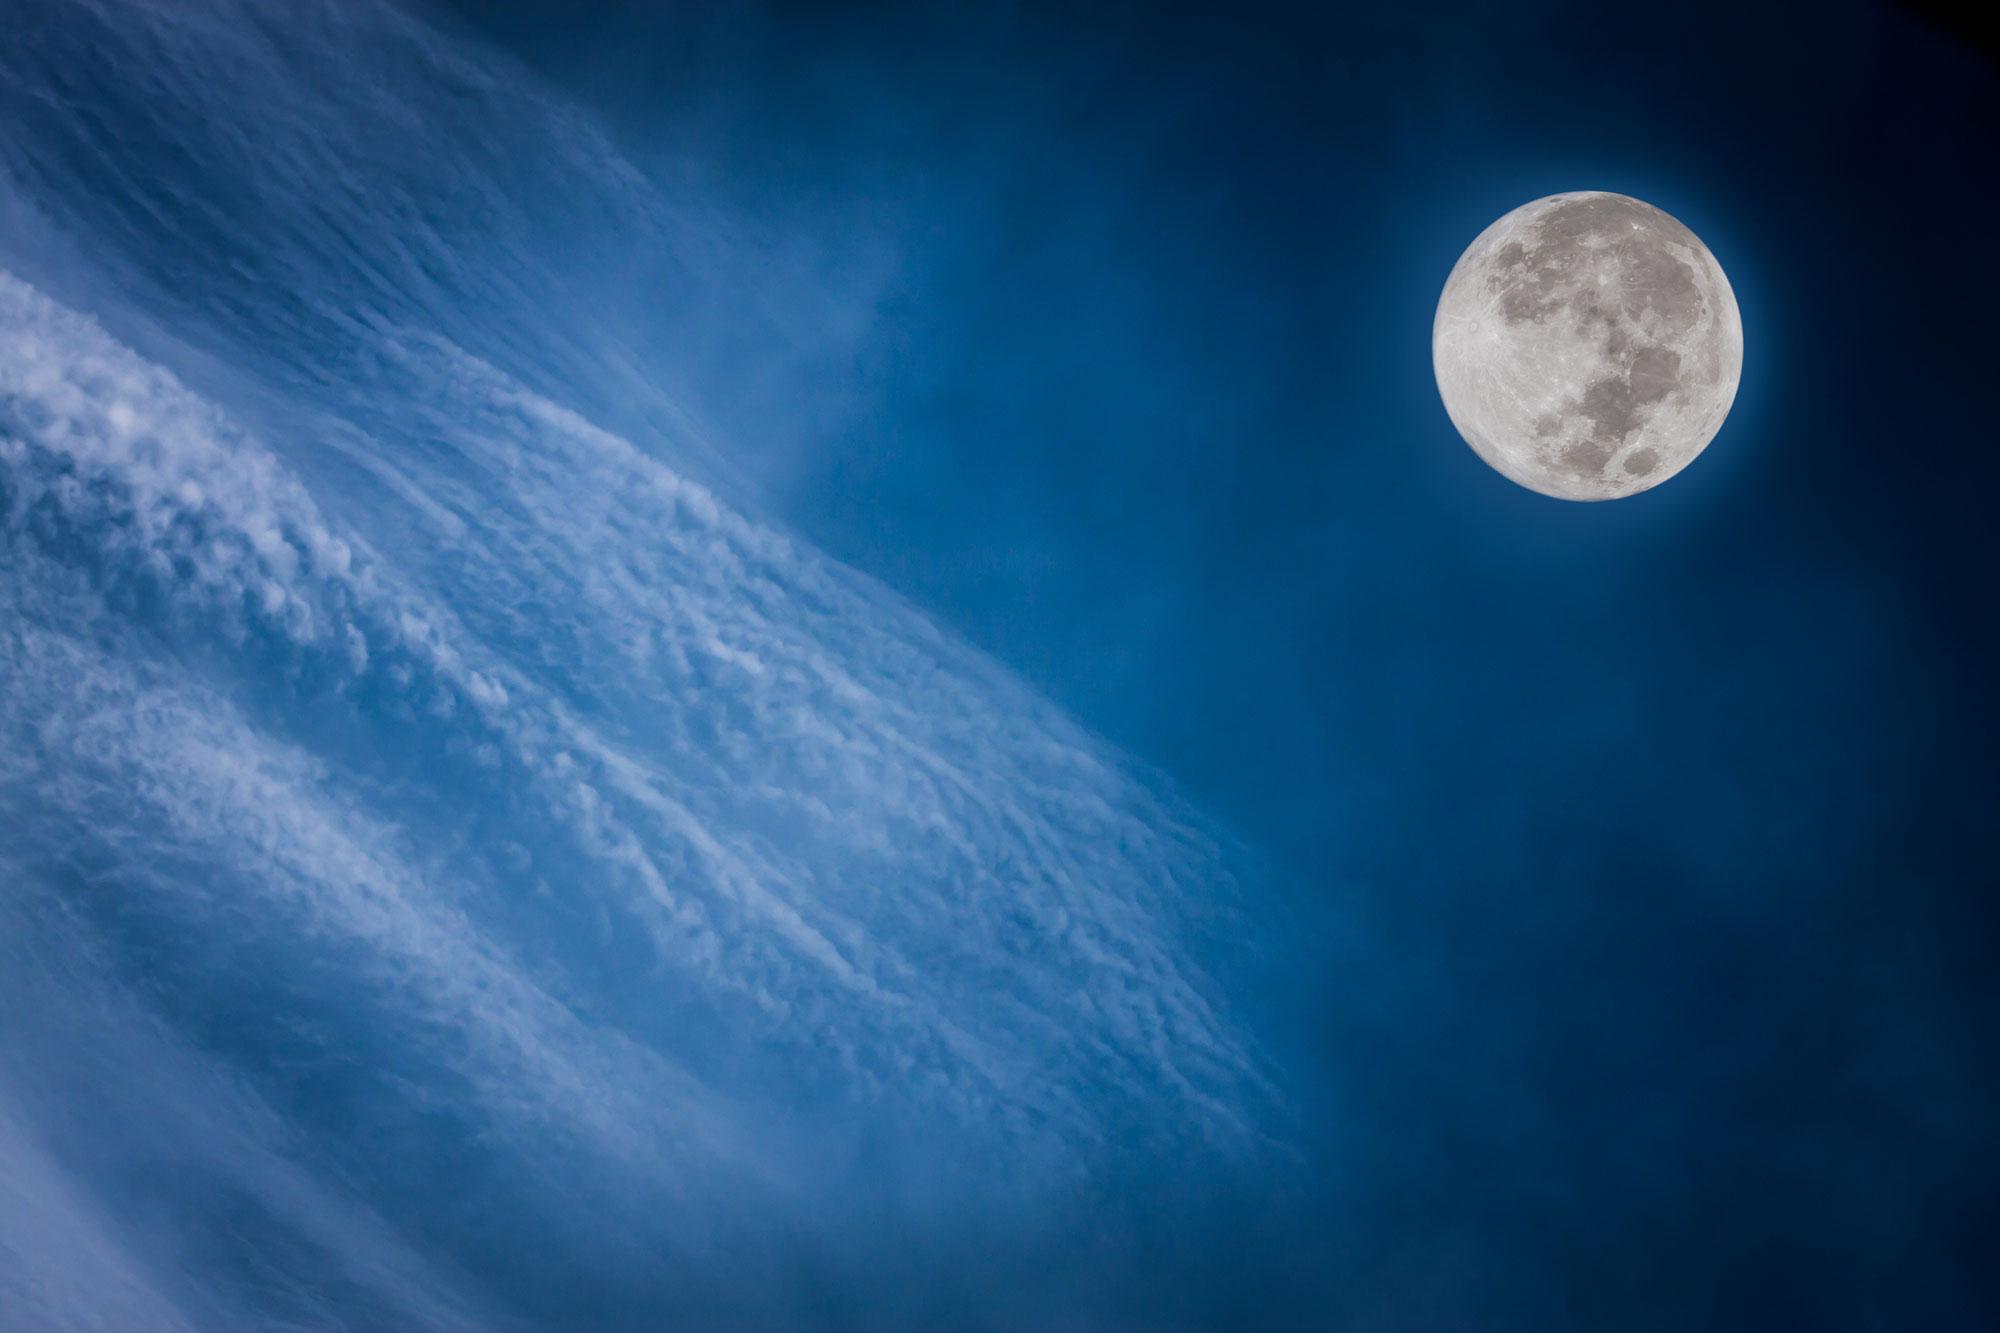 Volle maan 21 september 2021 ♥ Petra Stam ♥ Lichtwerkers Nederland